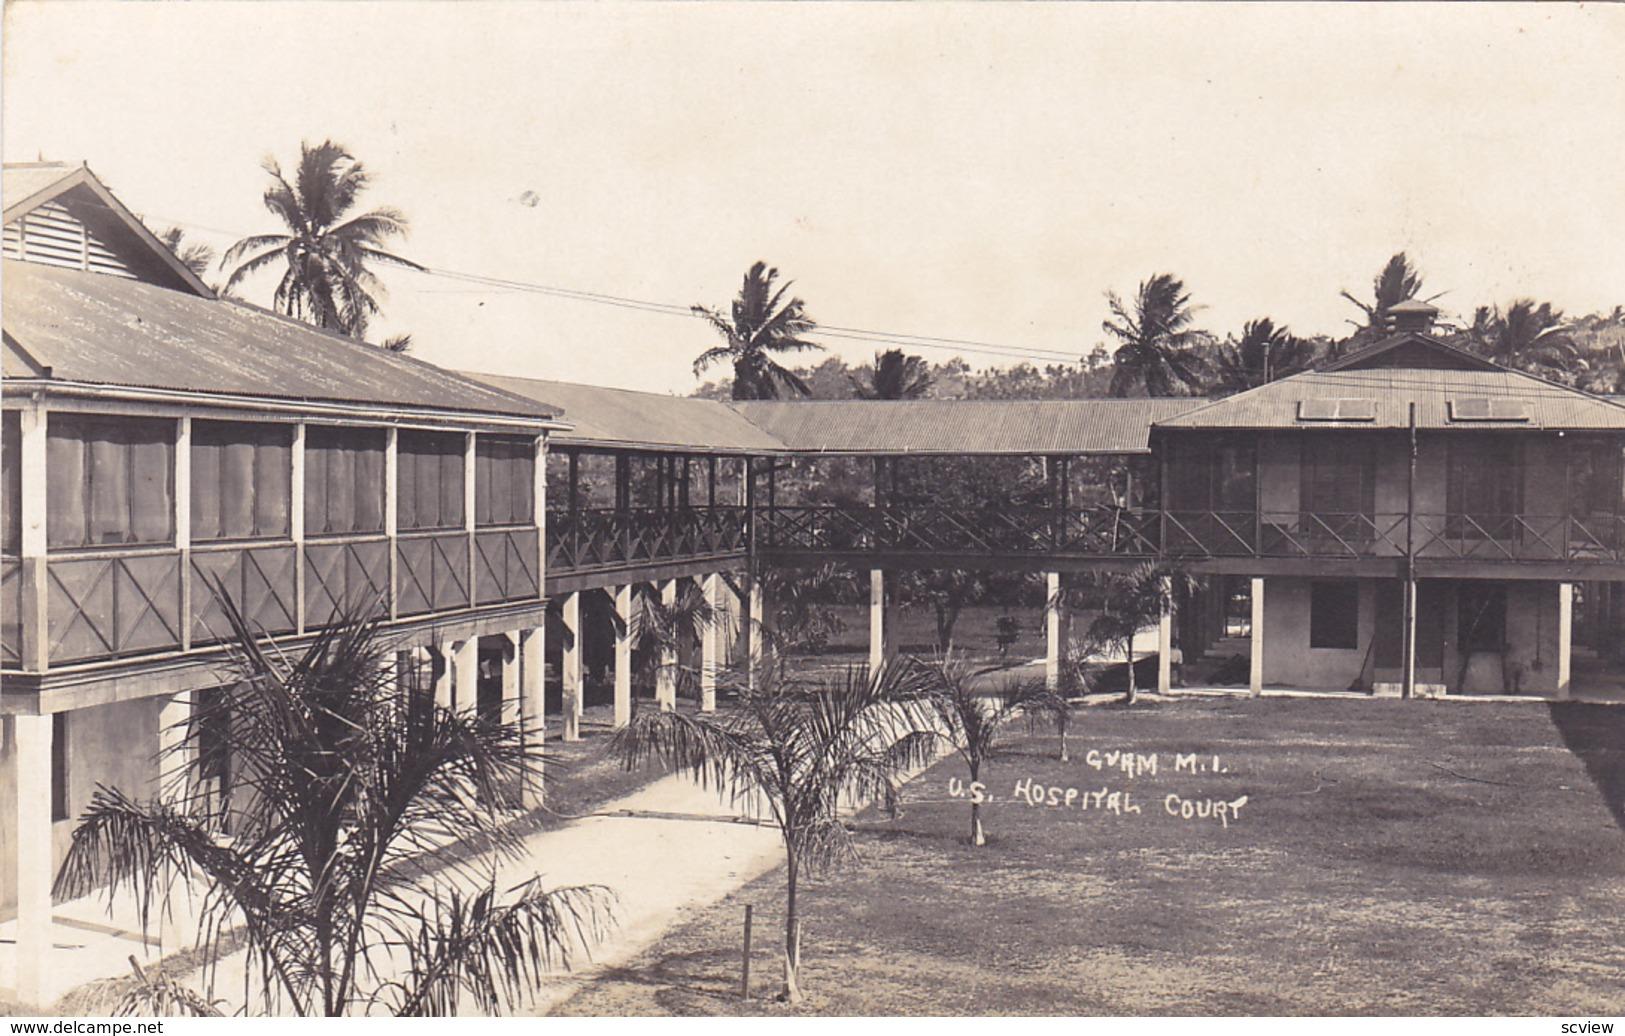 RP: U.S. Hospital Court , GUAM , 00-10s - Guam